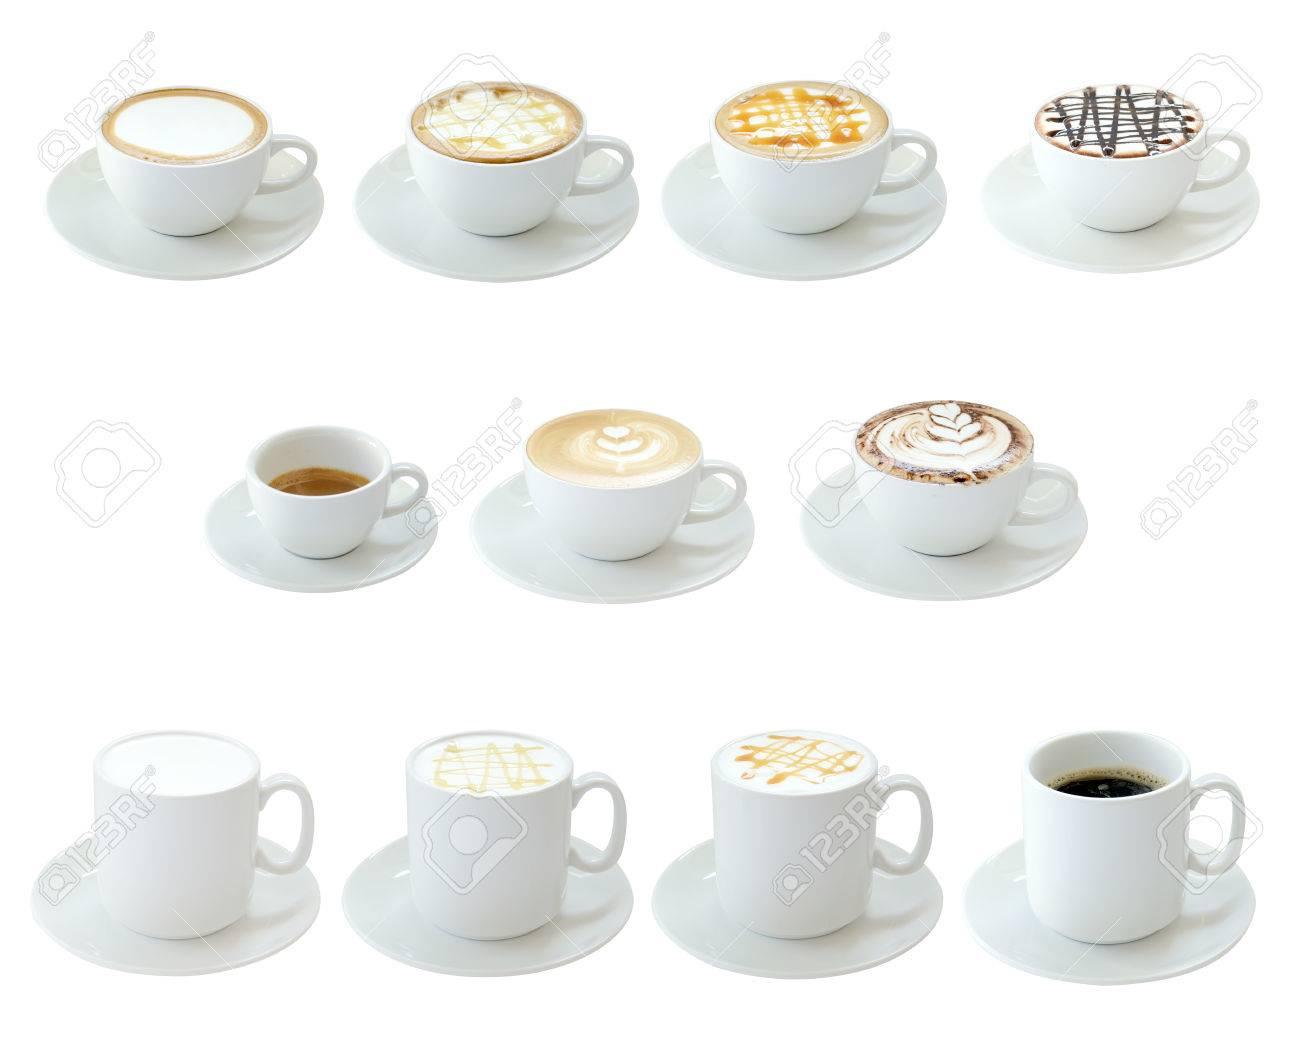 Set of hot drinks isolated on white background - 27528572